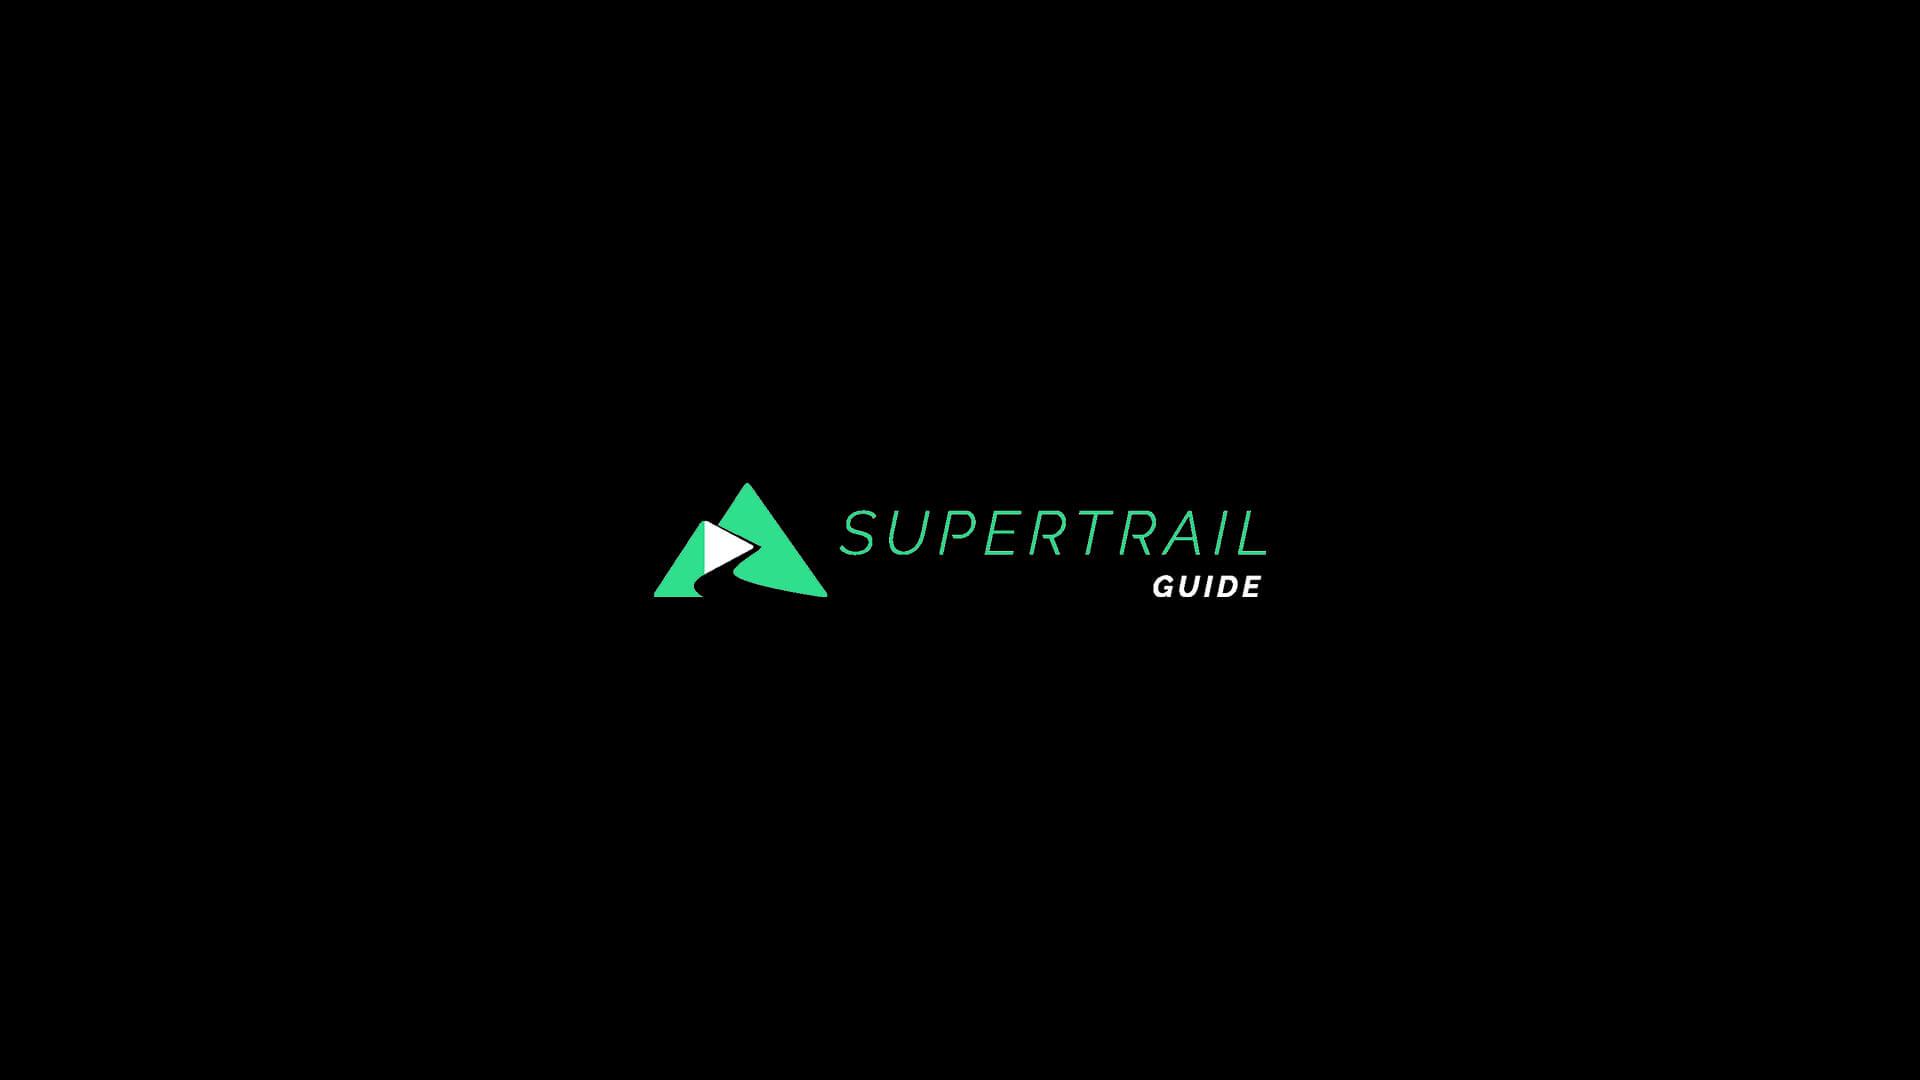 Supertrail Guide Logo on a Black Background